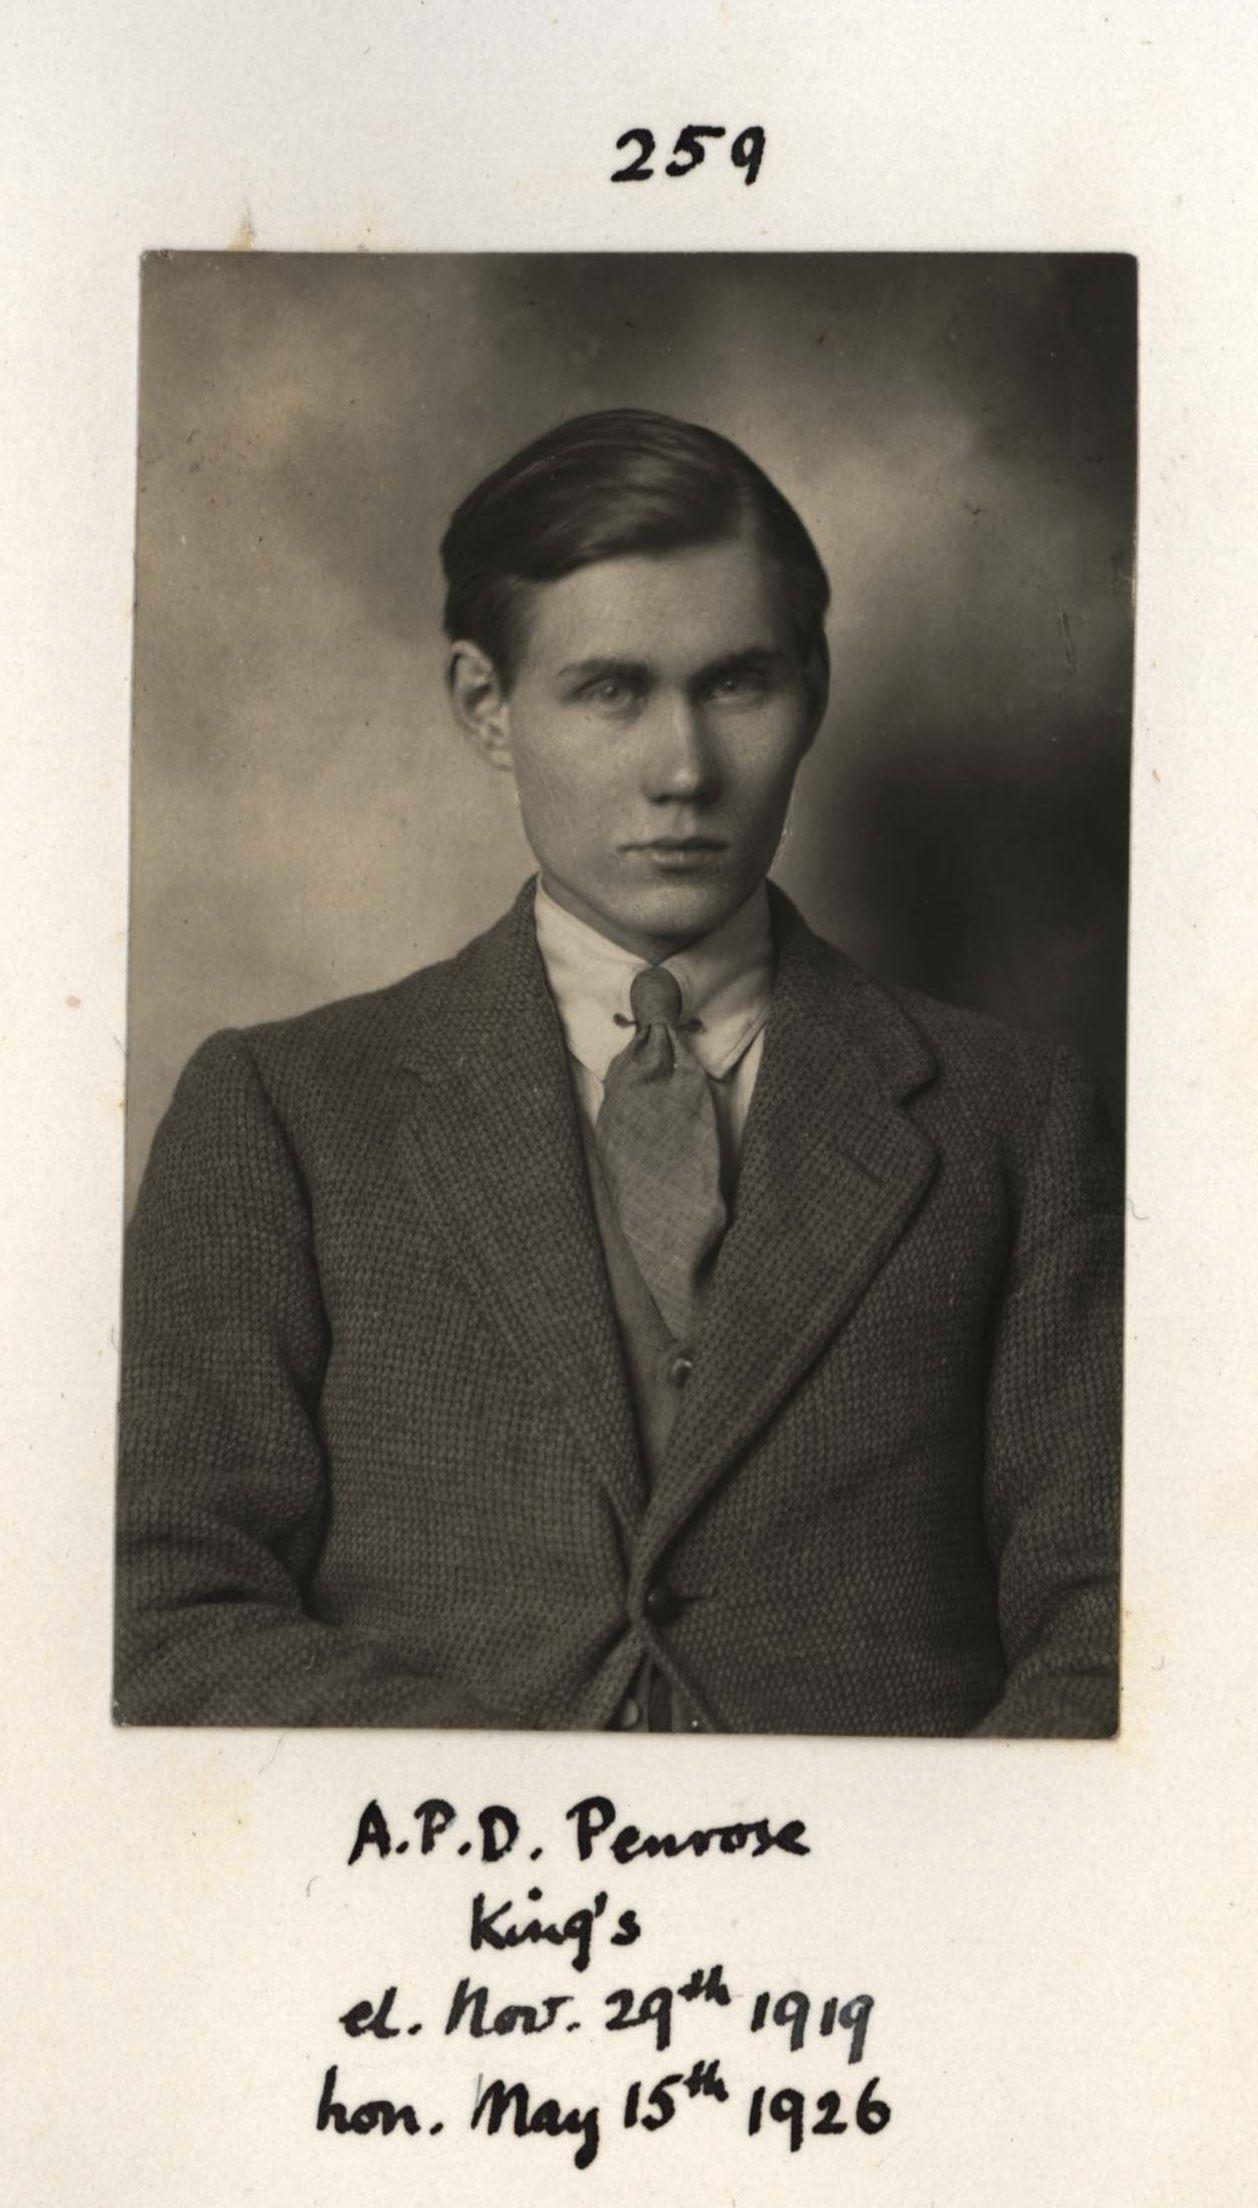 259: Penrose, Alexander Peckover Doyle. [KCAS/39/4/1, Photobook, p.78]